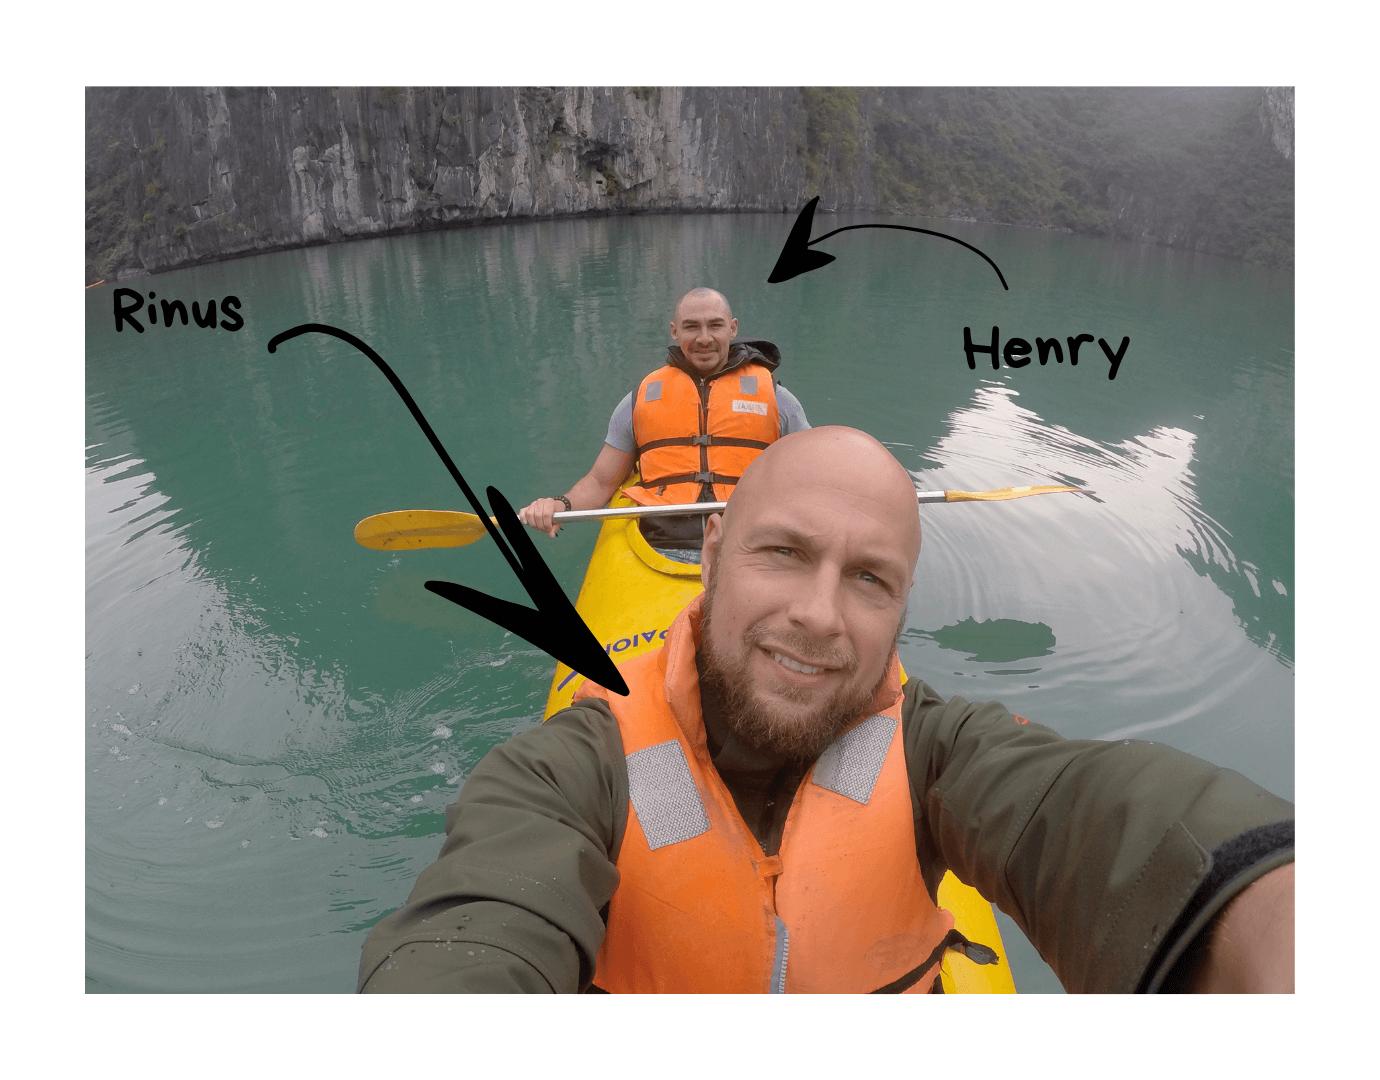 producten review droog trainen protocol mannen Henry en Rinus